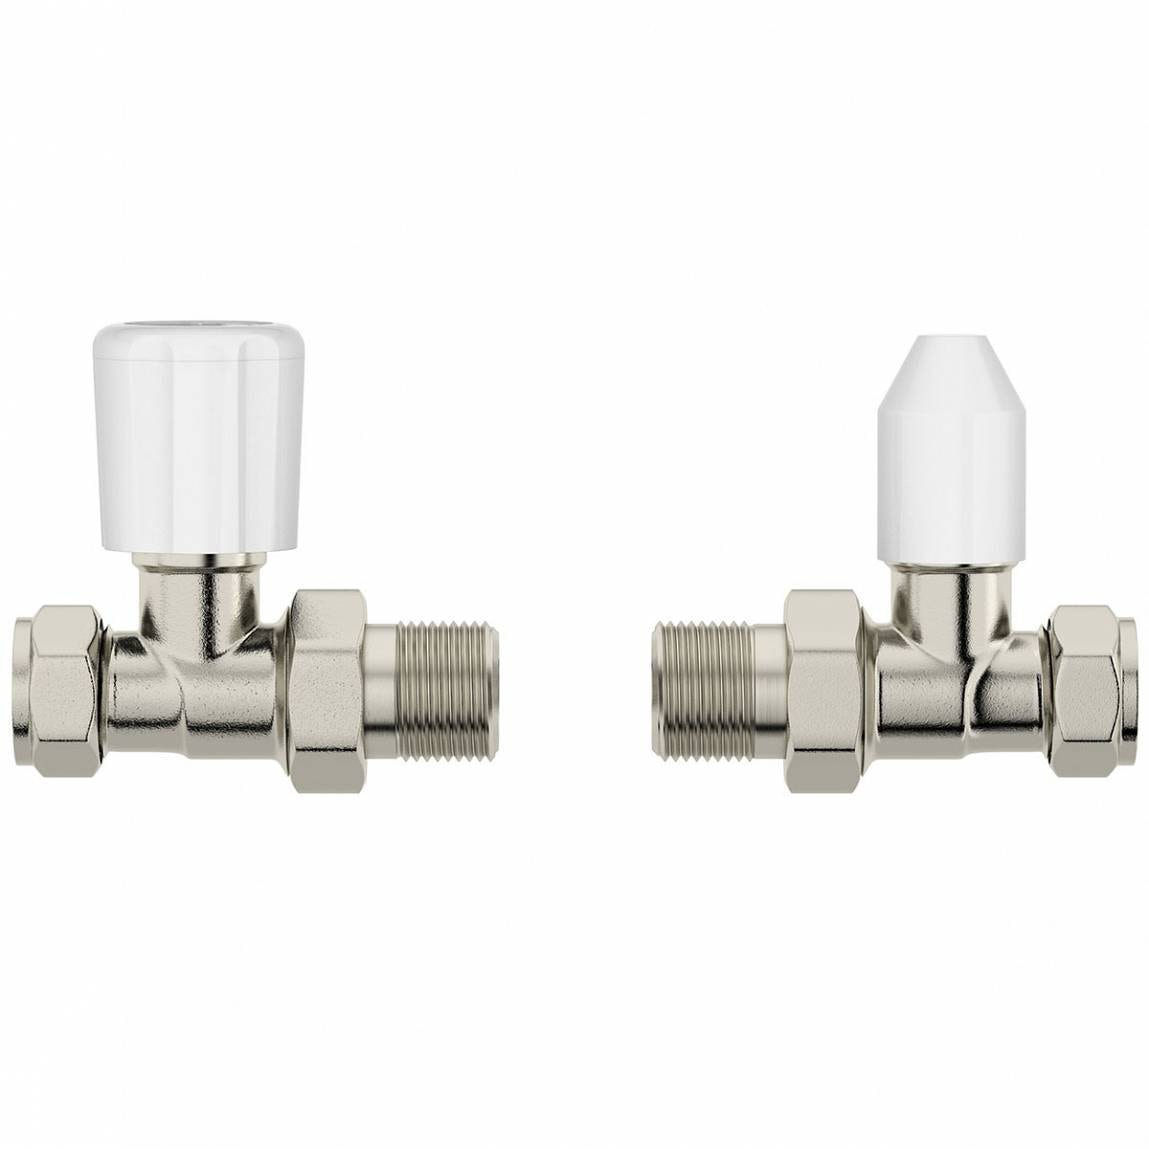 Clarity straight radiator valves